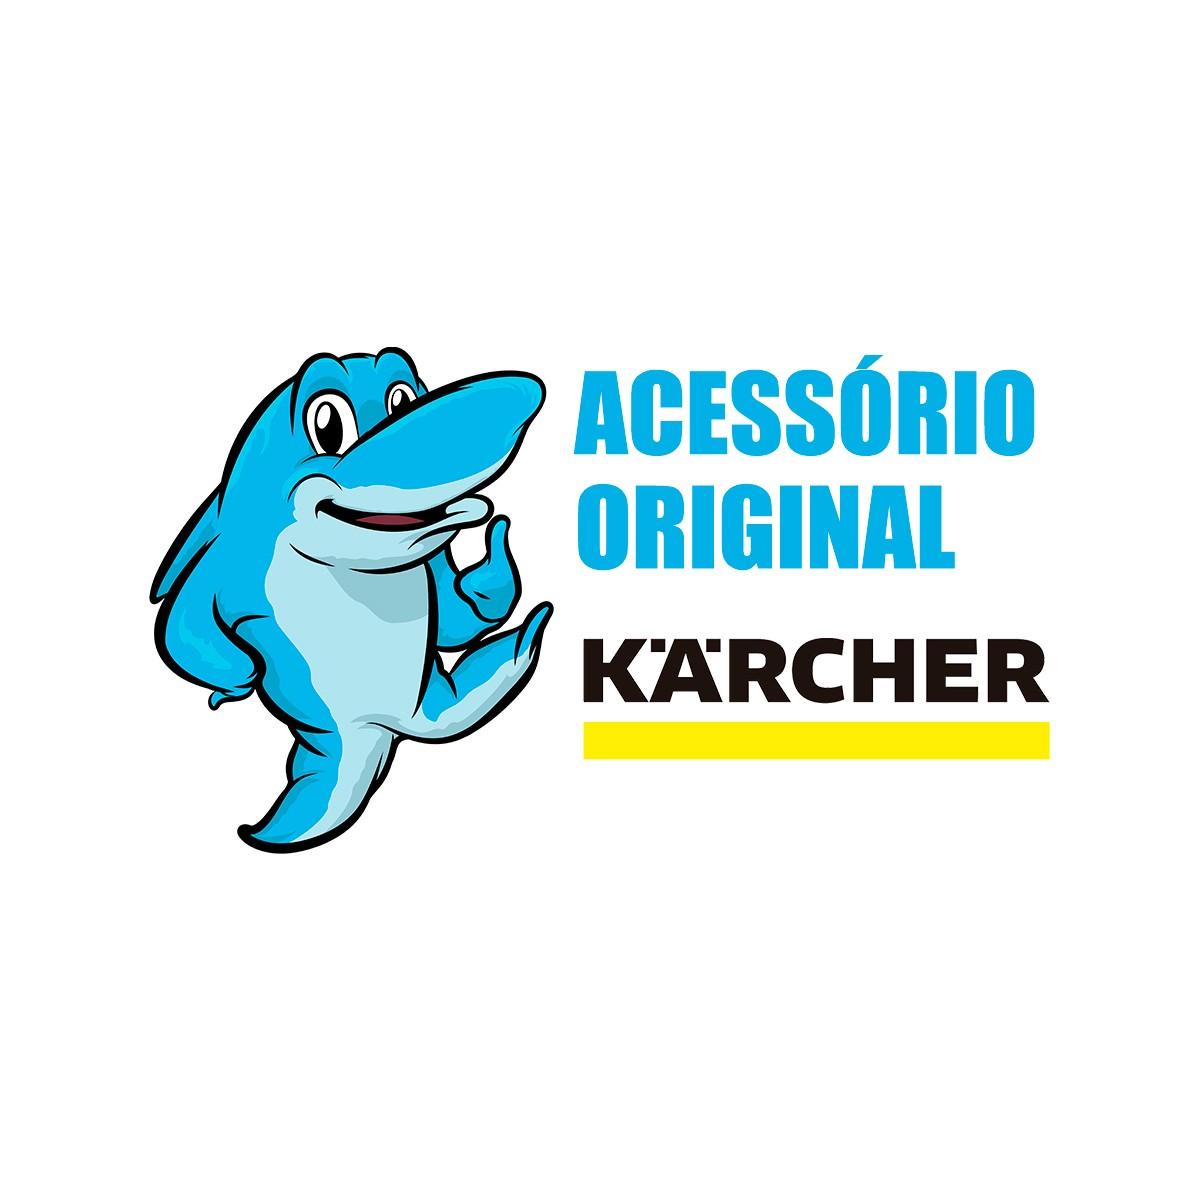 Mangueira para Lavadora Karcher K2500 Black, K3 Premium, K3.98 (Nova), K3.30 (Nova), K4 Power Plus, K430 Power Silent, K5 Power Plus 6mts Original